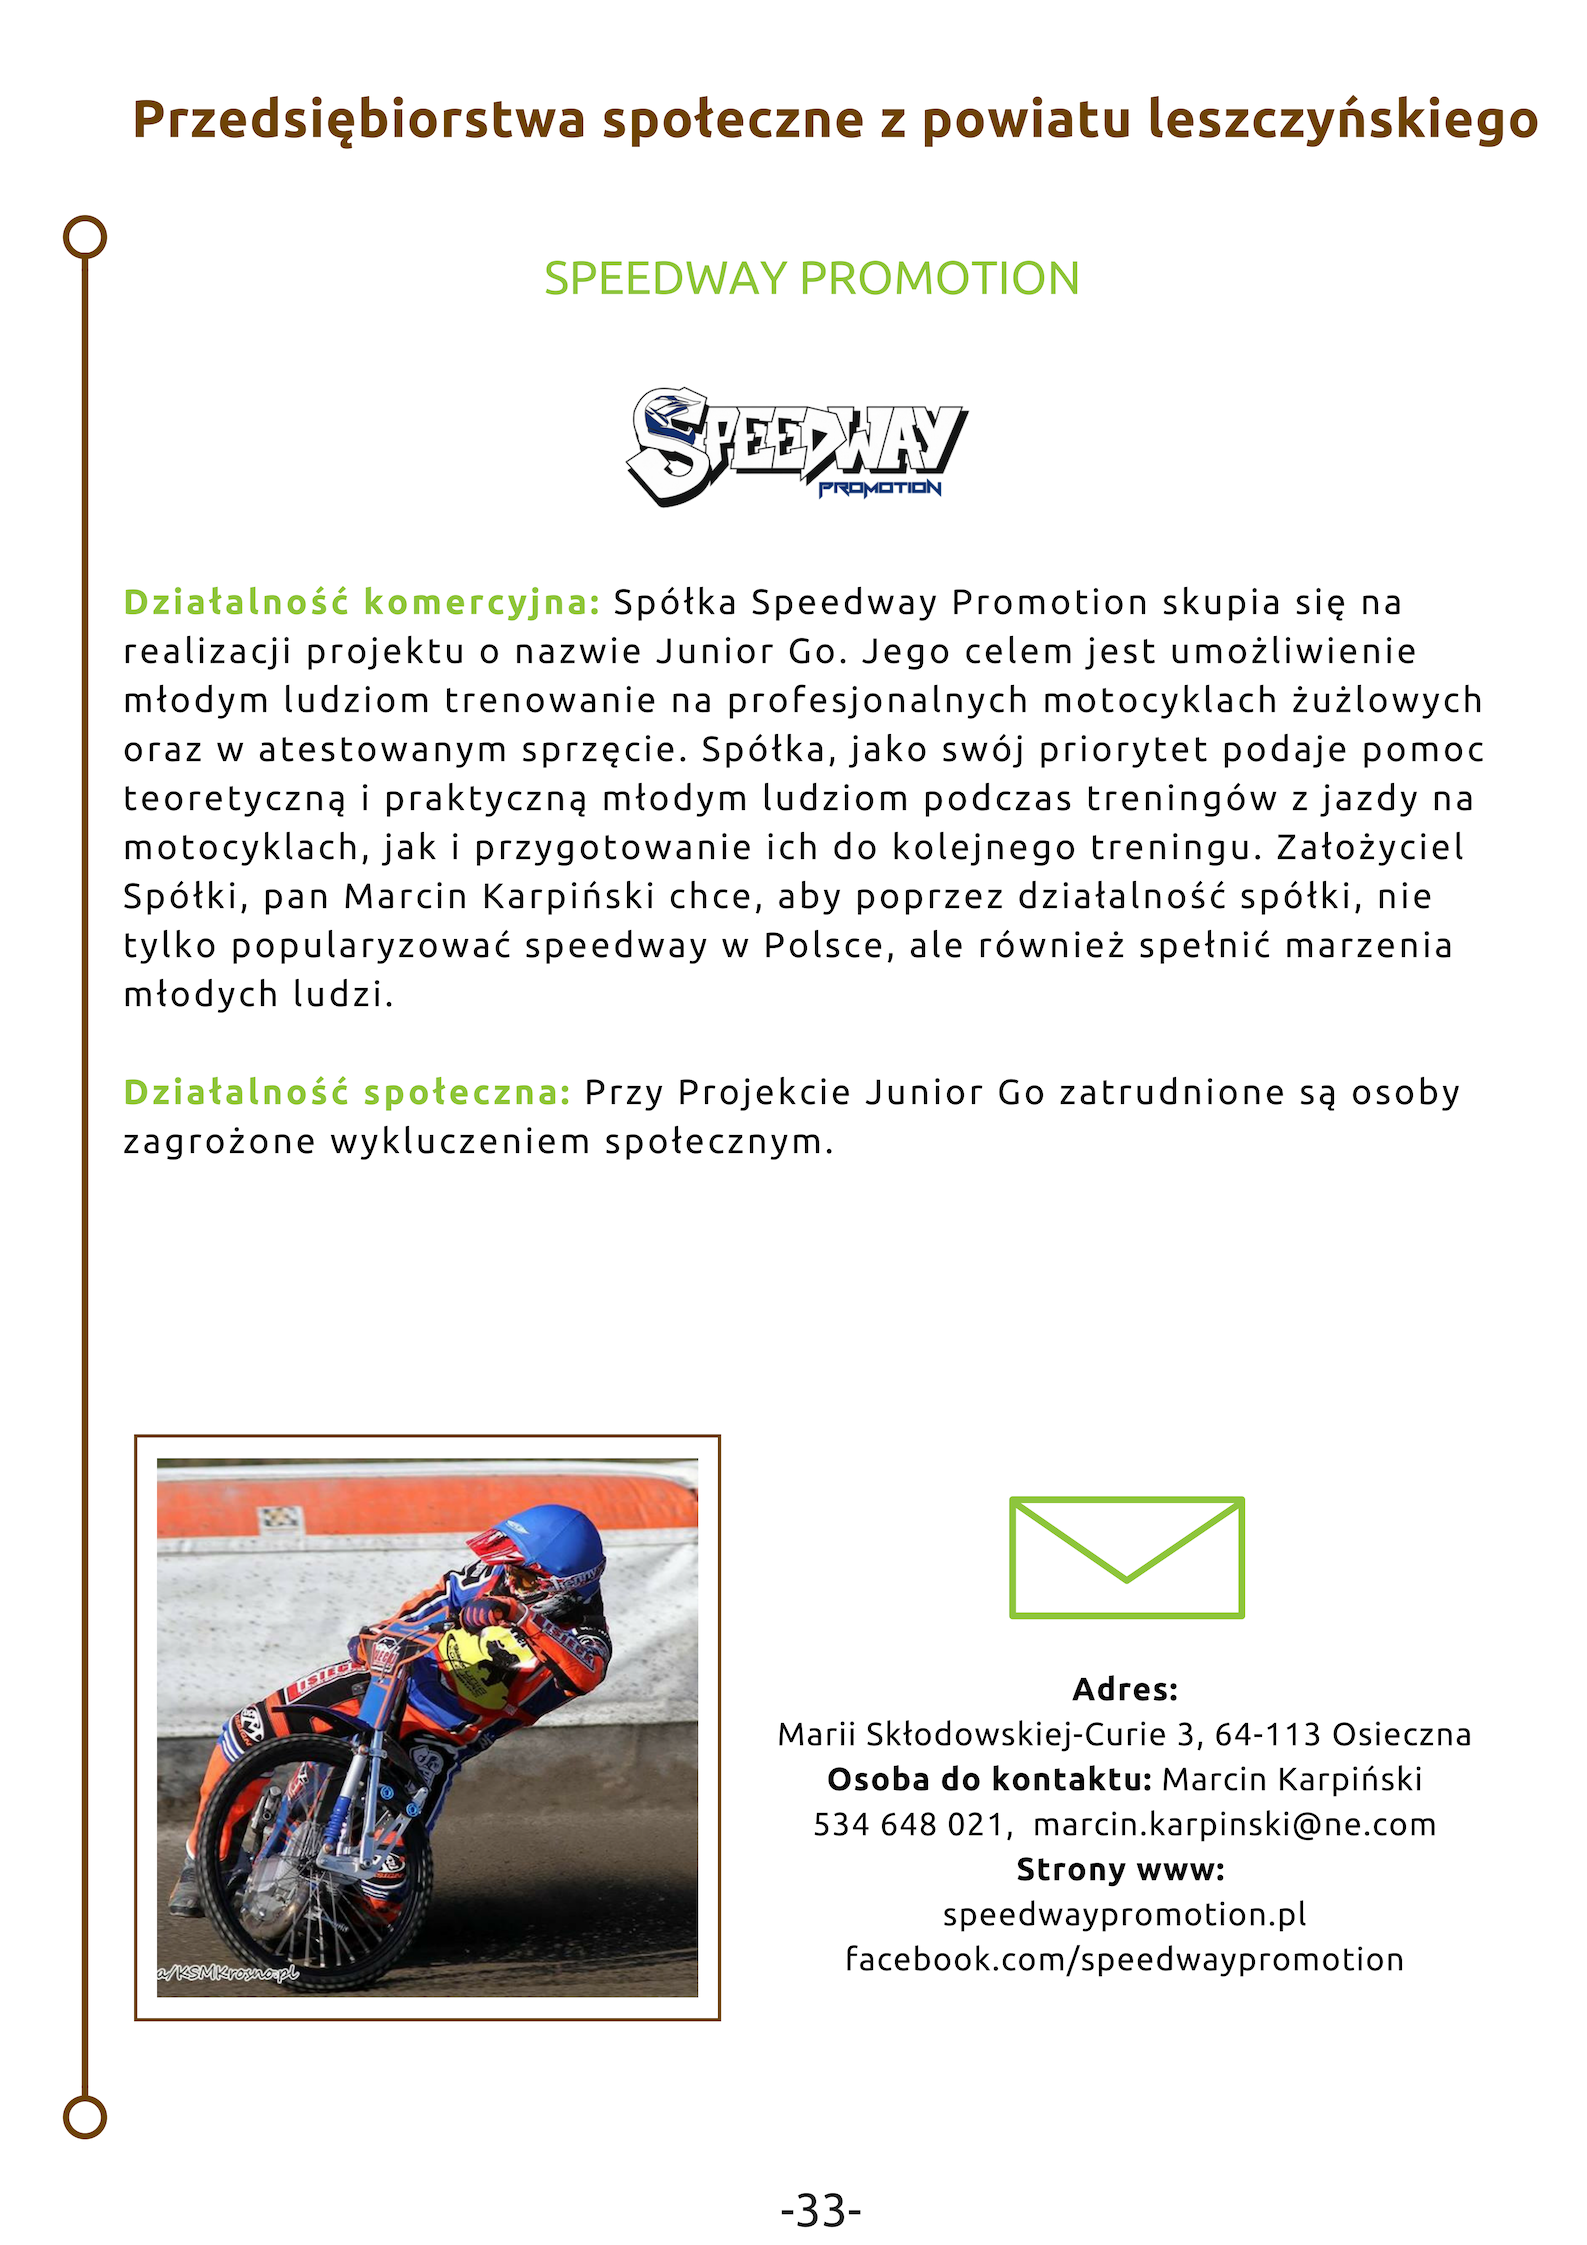 Speedway promotion logo